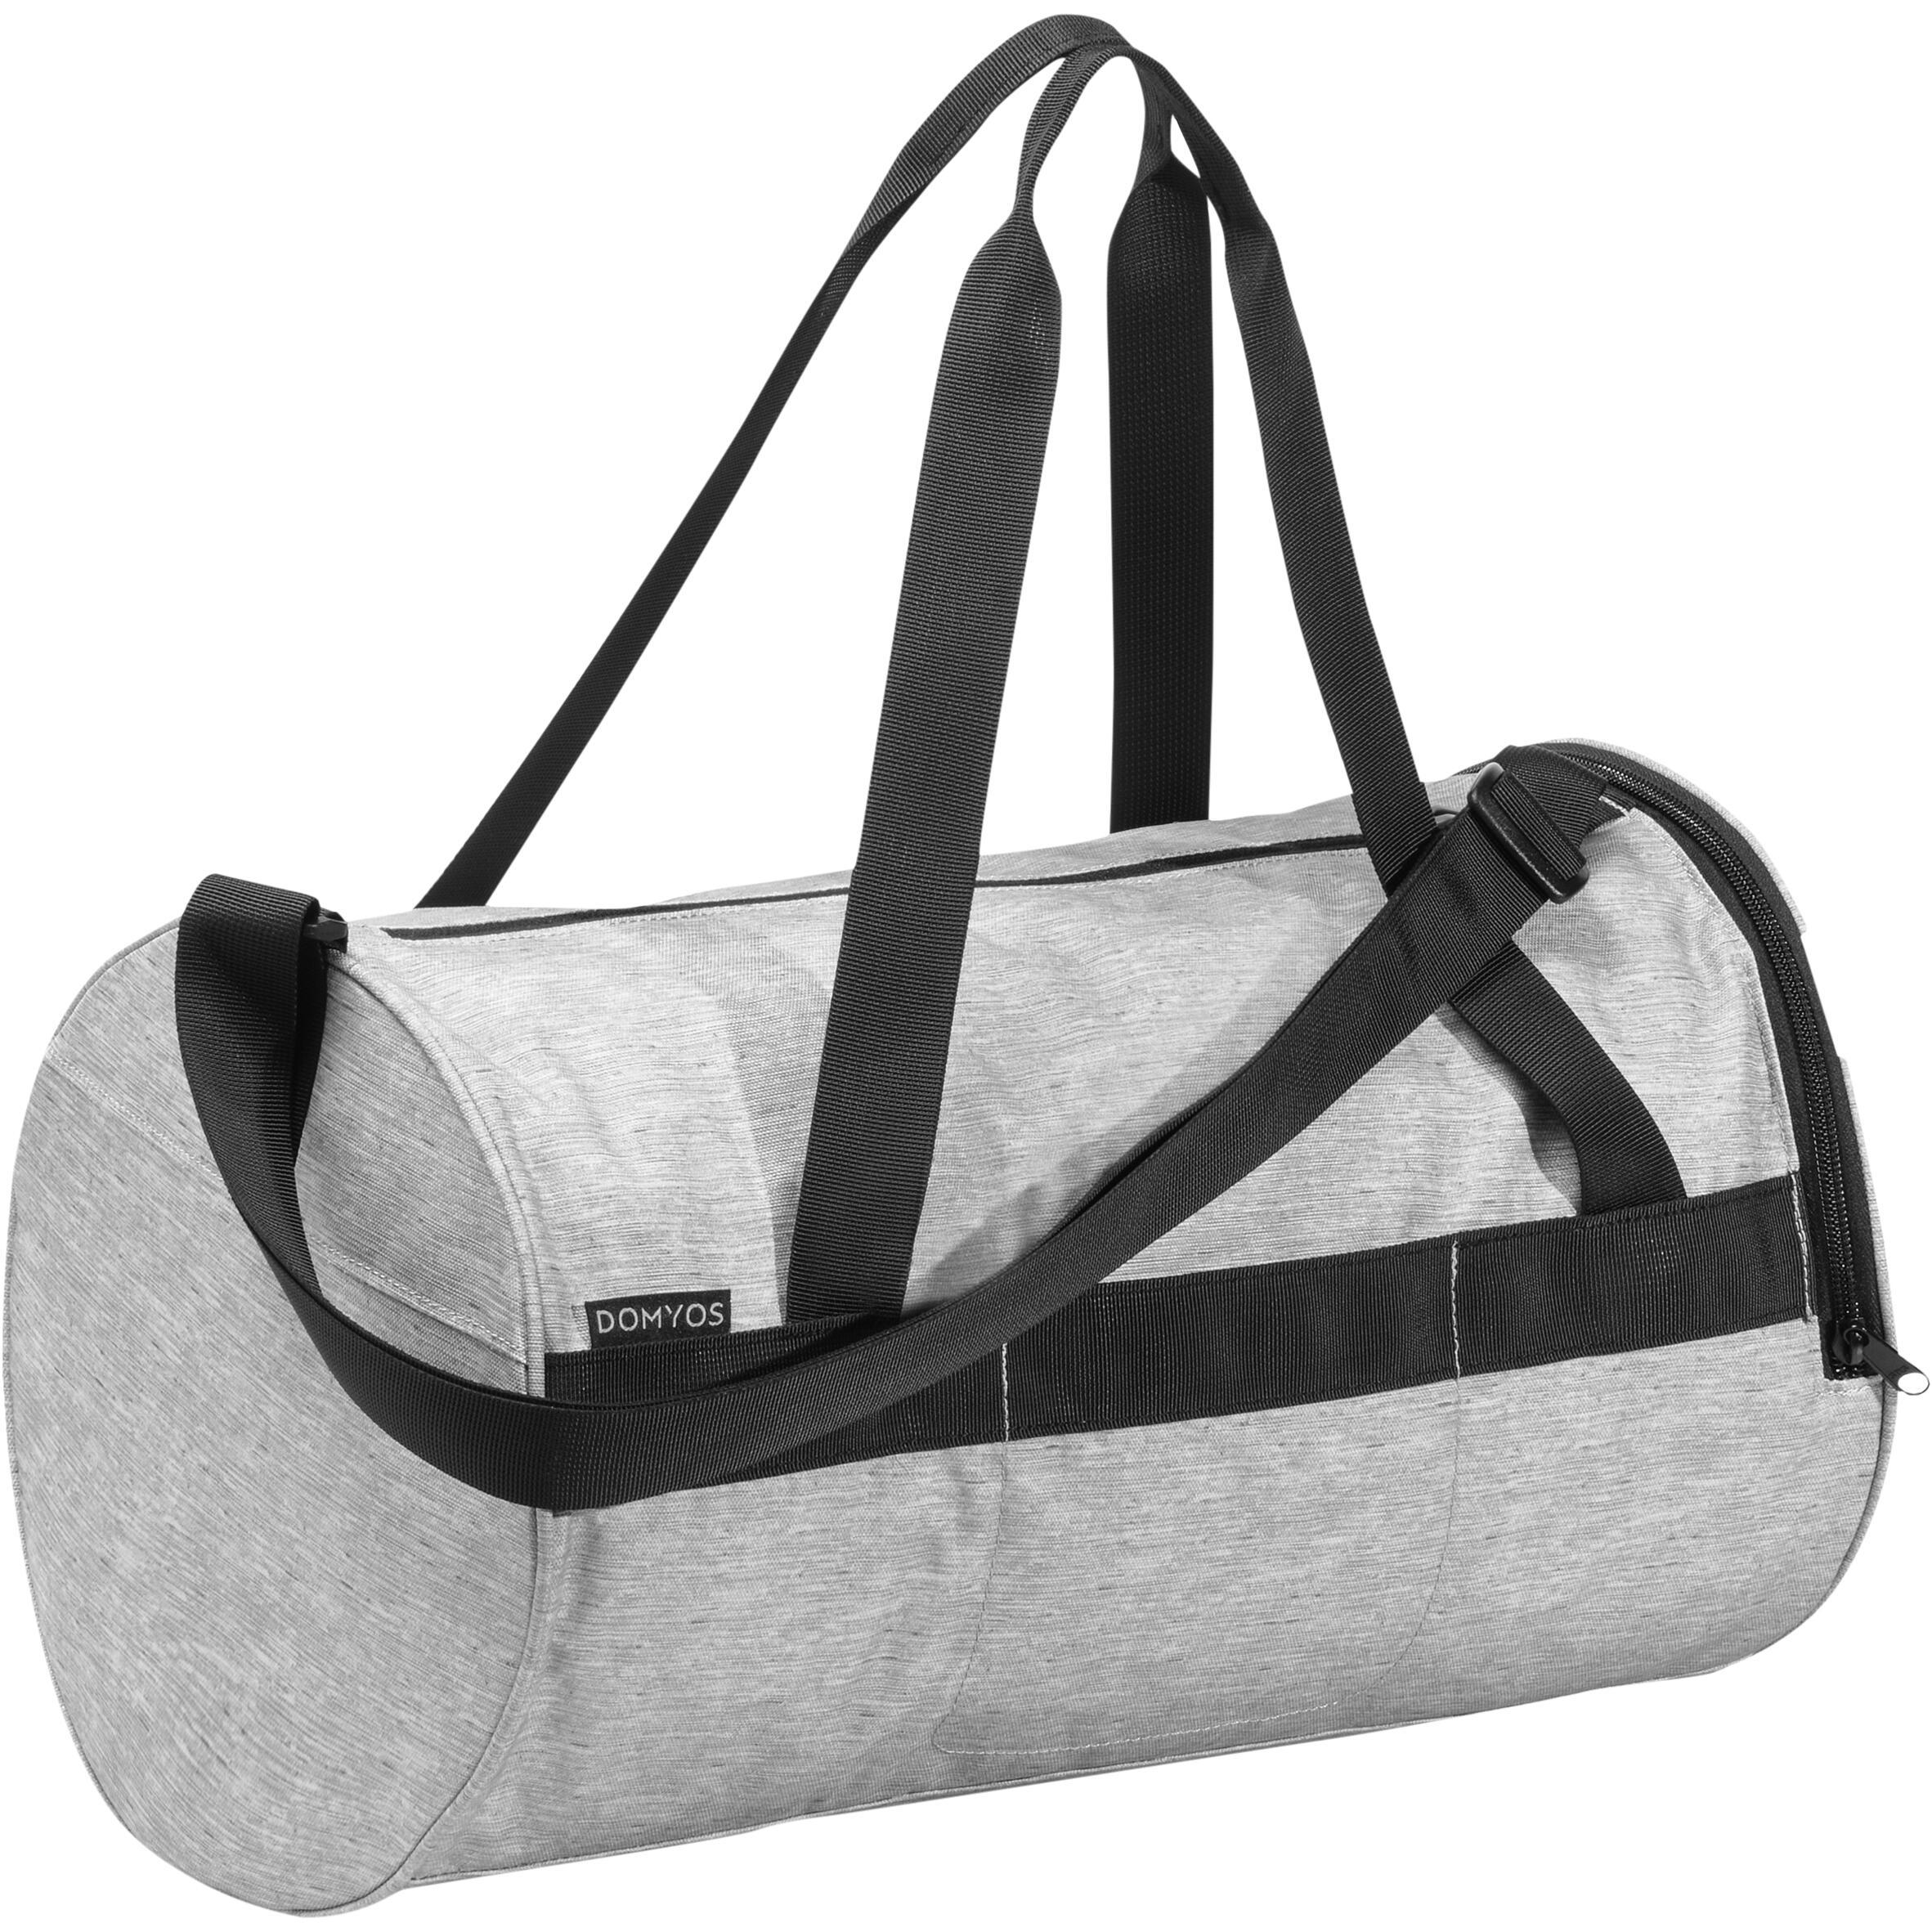 20L Fitness Bag - Pink/Blue/Green Print